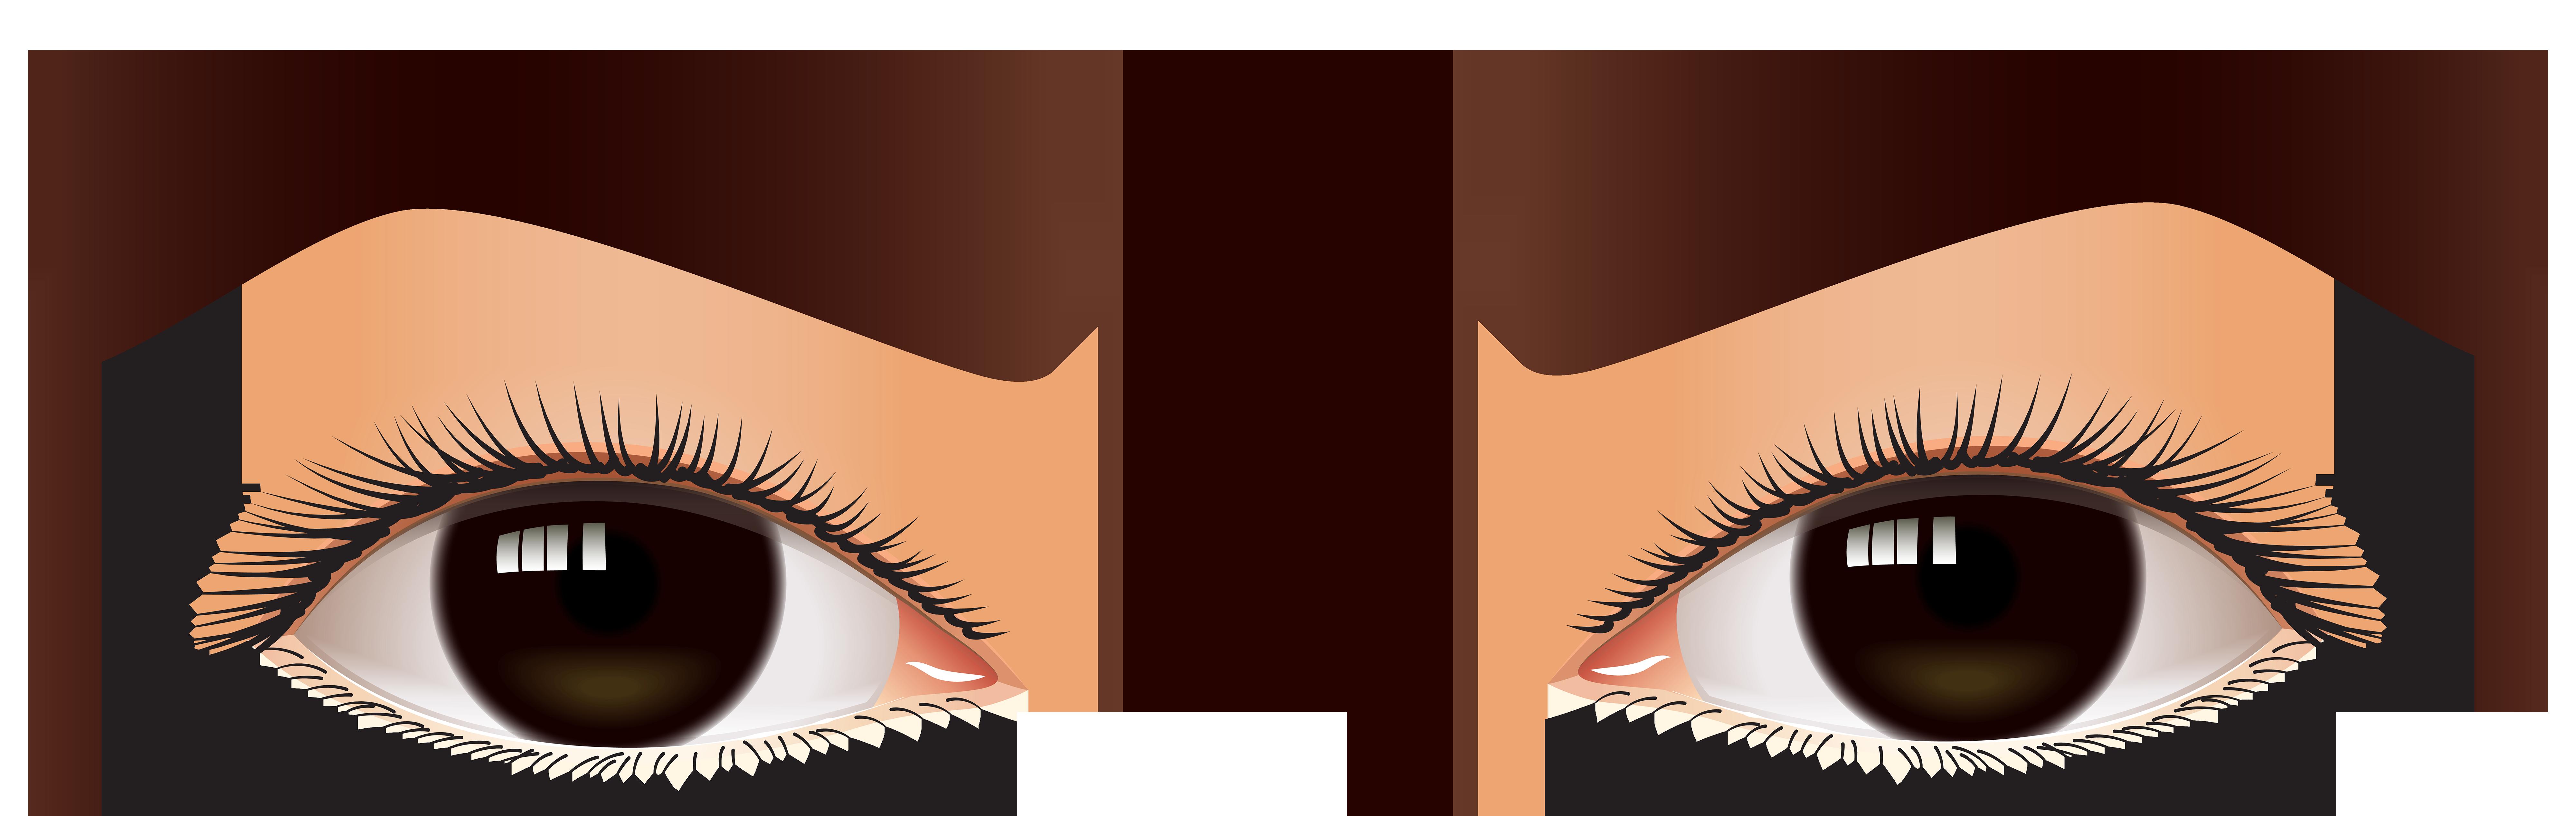 Eye eye clipart svg freeuse Brown Eyes Clipart | Free download best Brown Eyes Clipart on ... svg freeuse